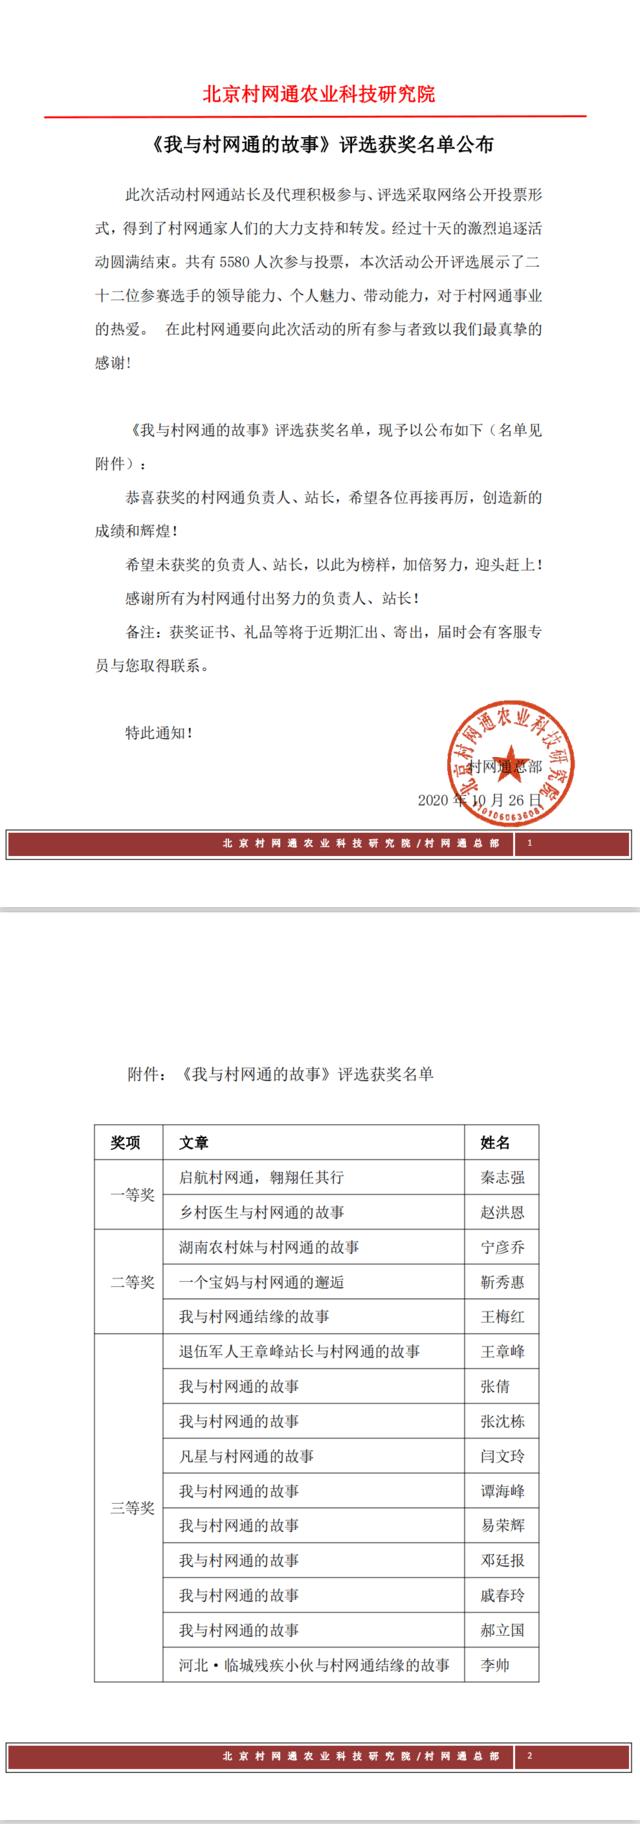 QQ截图20201026161124.png